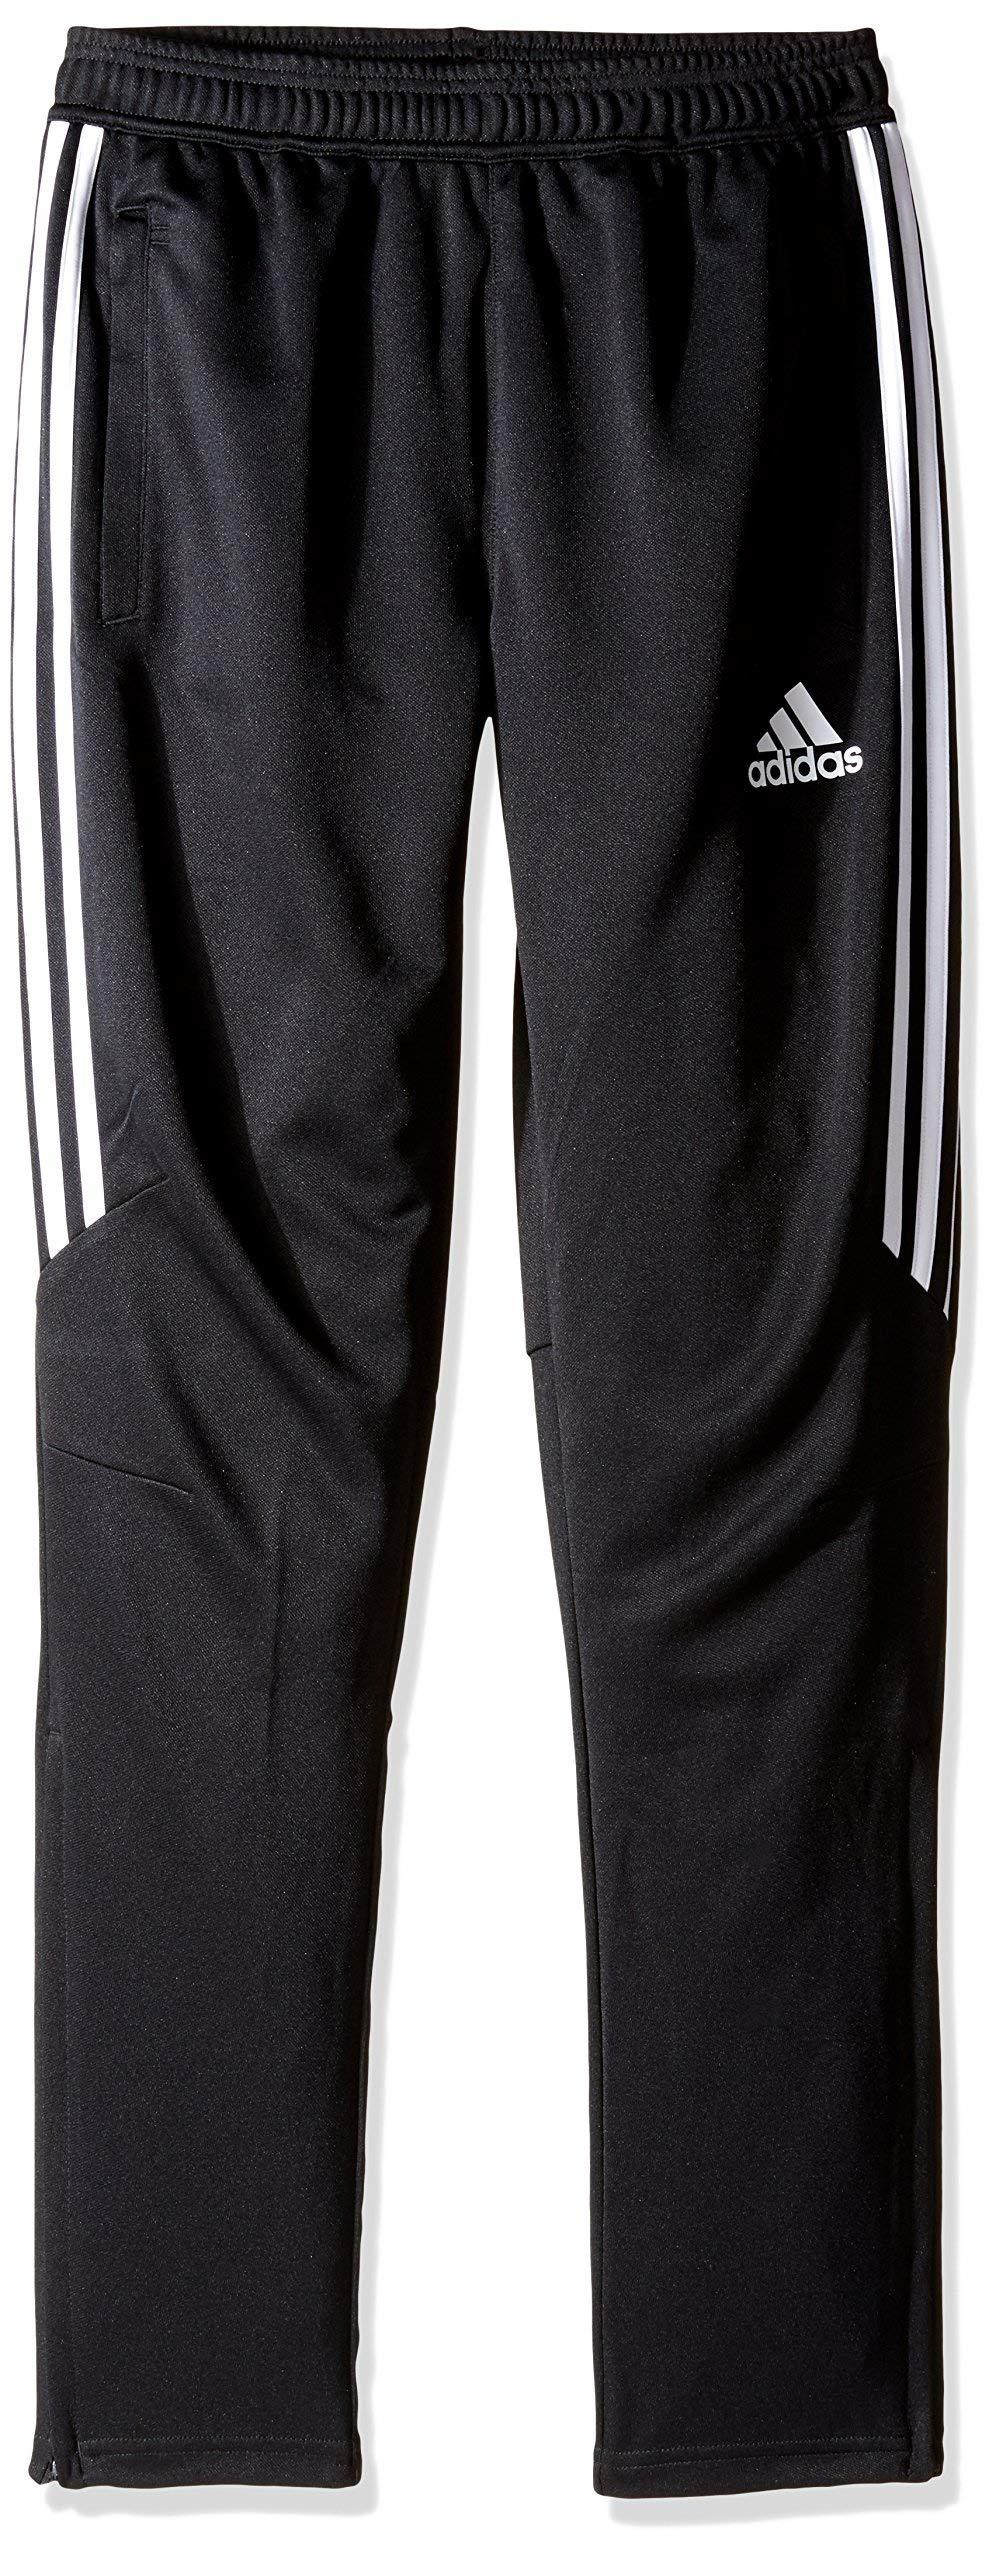 adidas Women's Condivo 16 34 Pant | WORLDRUGBYSHOP.COM